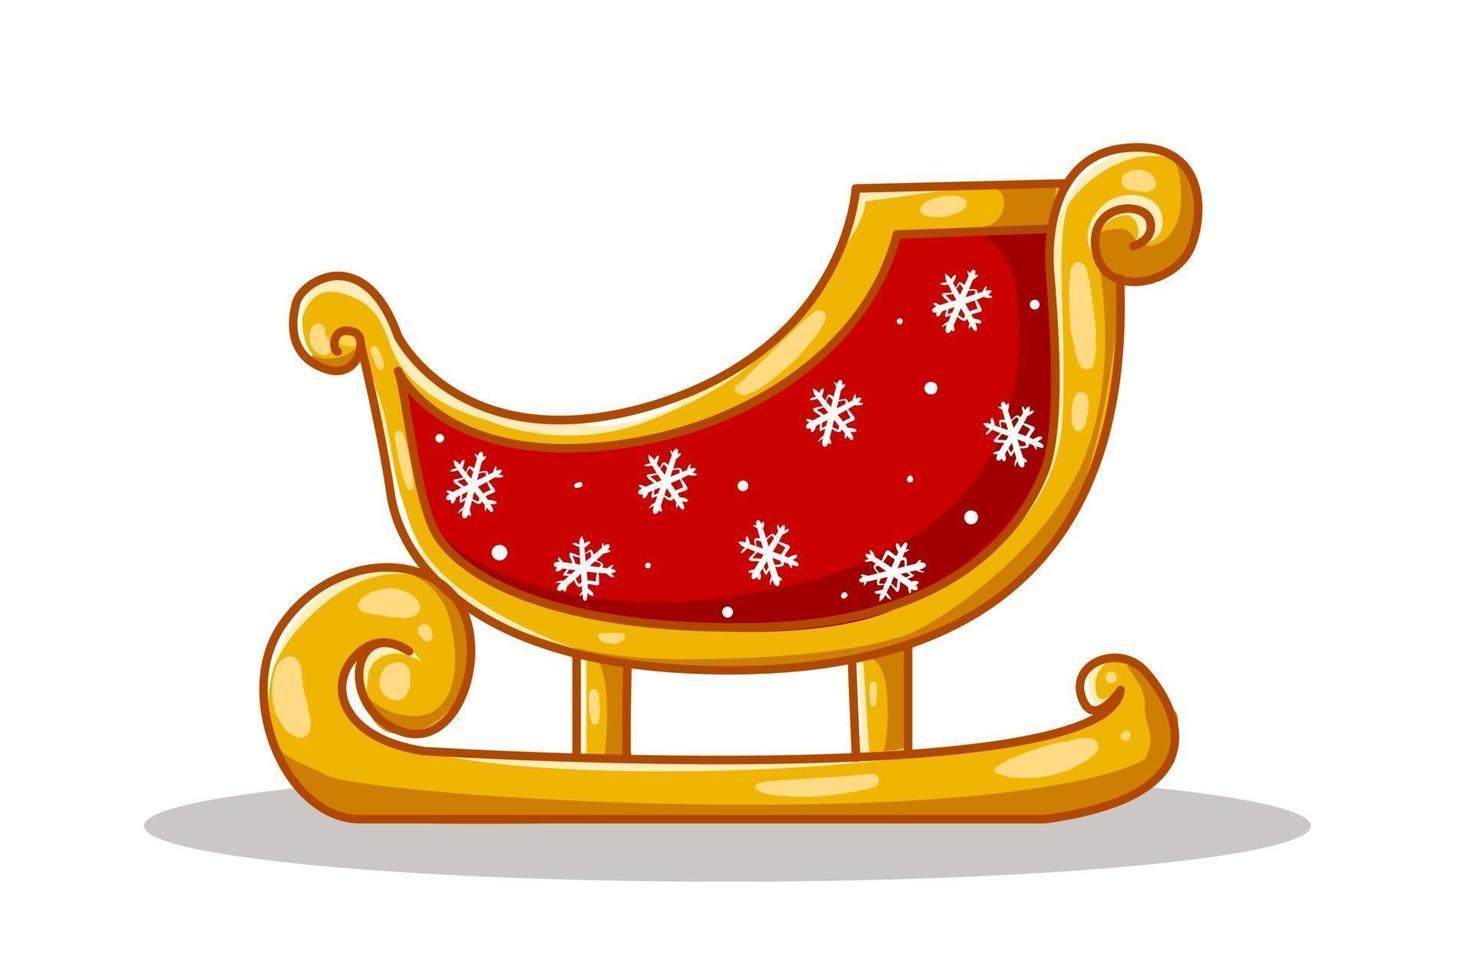 ilustração de trenó de Papai Noel vetor